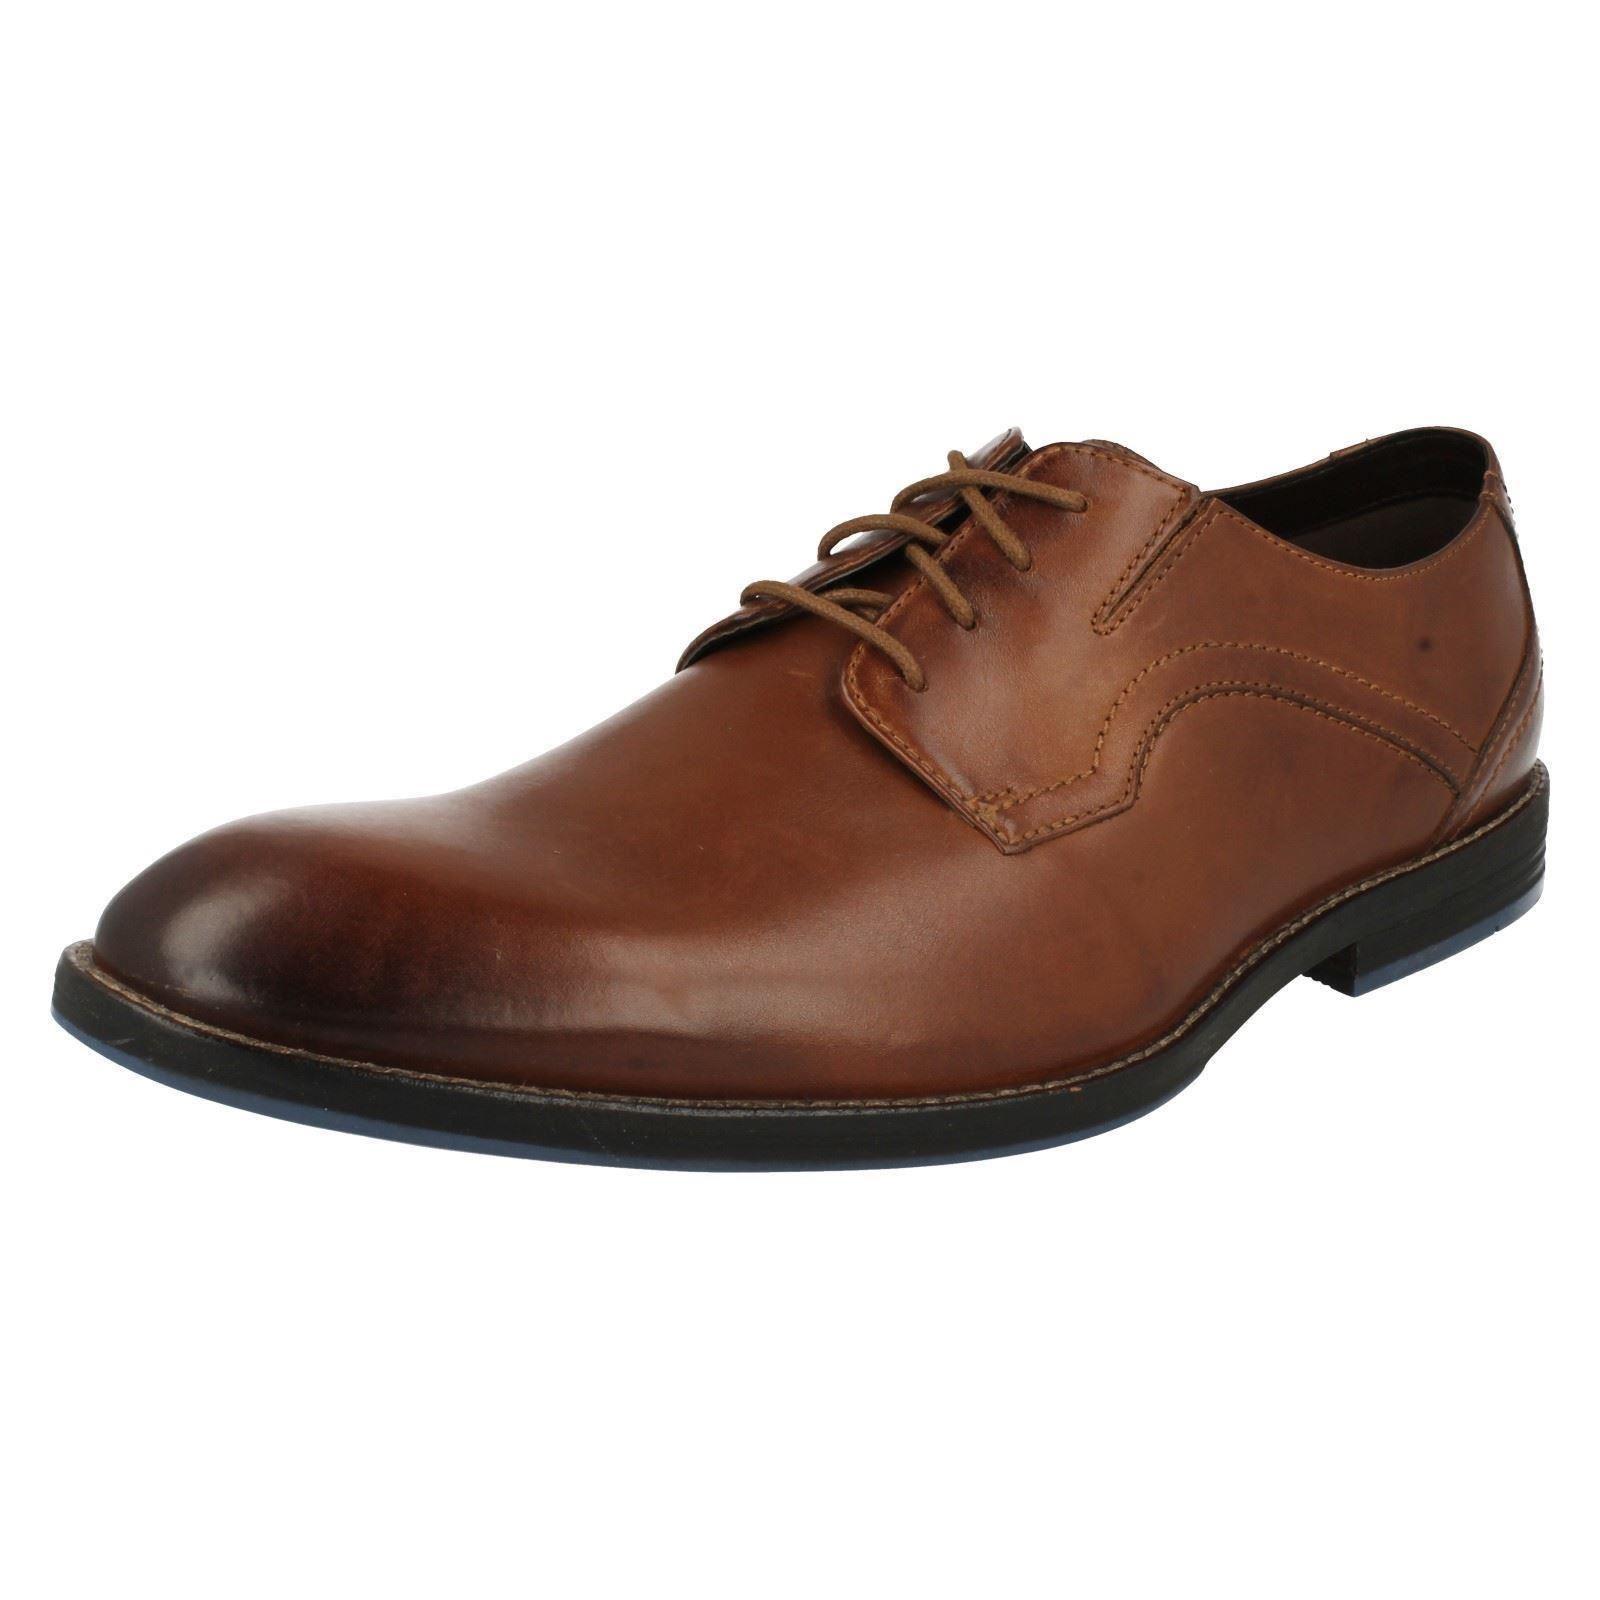 Mens Clarks Formal - Lace Up Leather Shoes - Formal Prangley Walk 161699